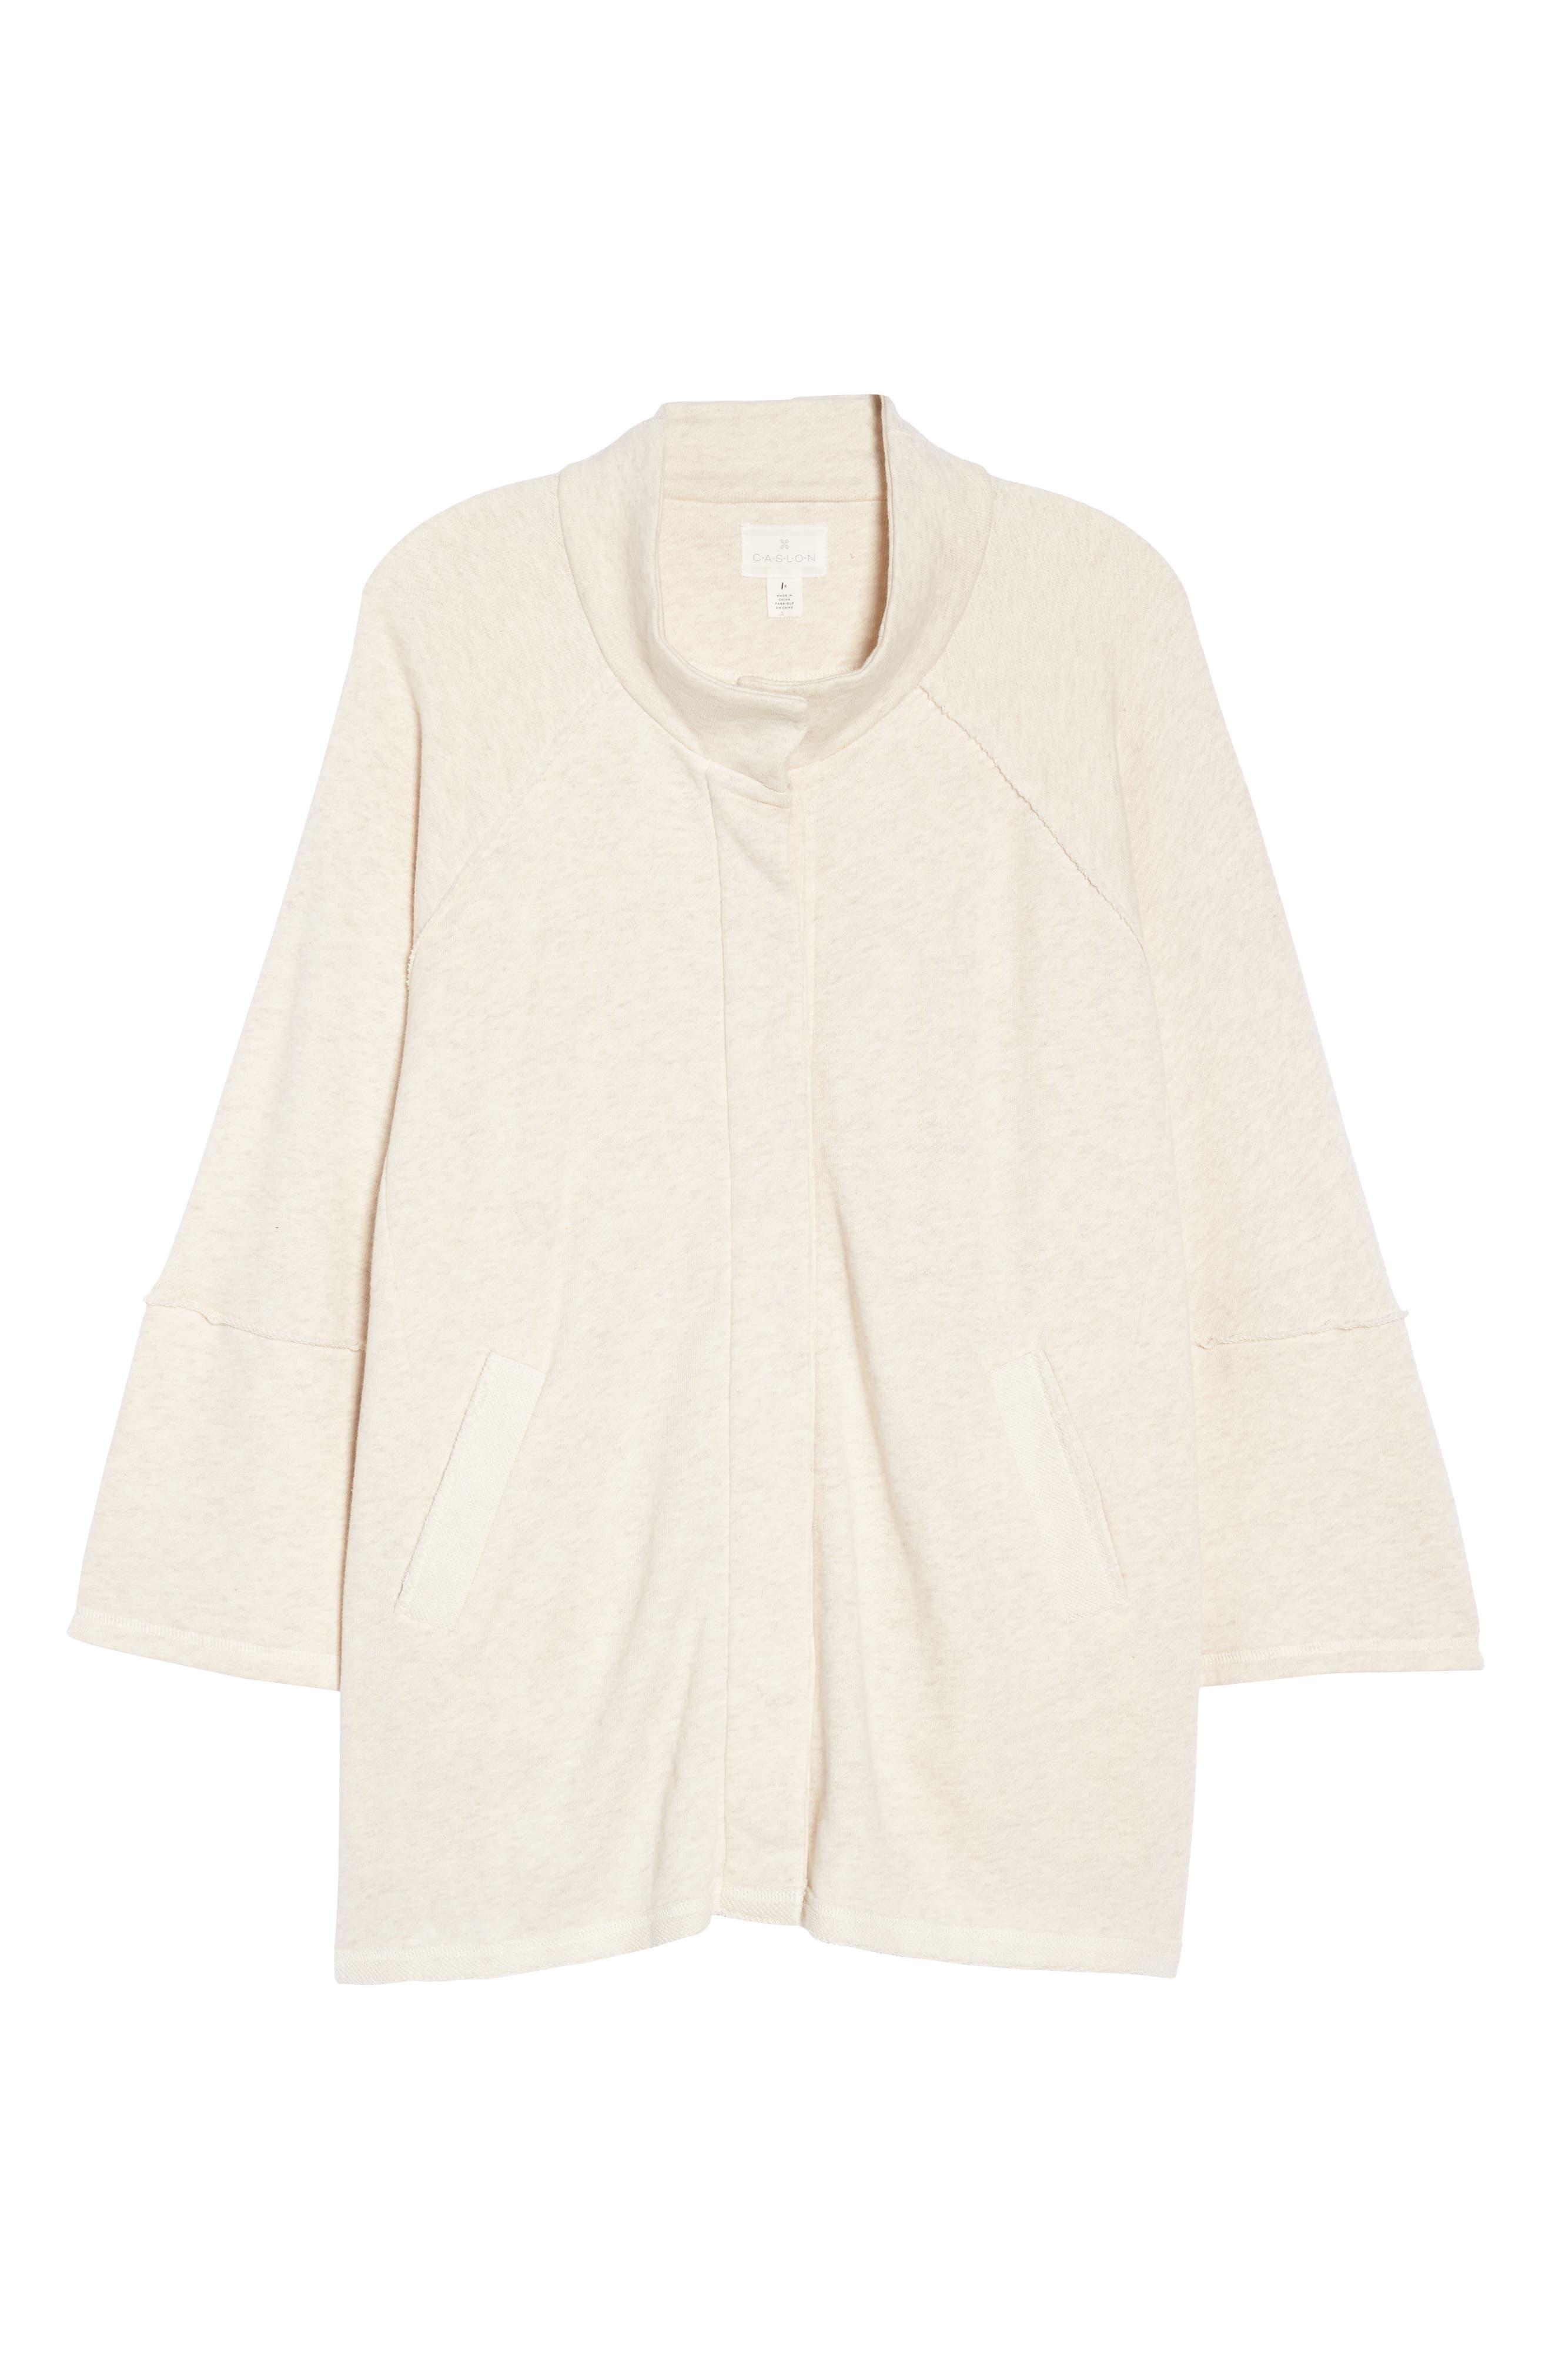 Button Front Knit Jacket,                             Alternate thumbnail 6, color,                             270